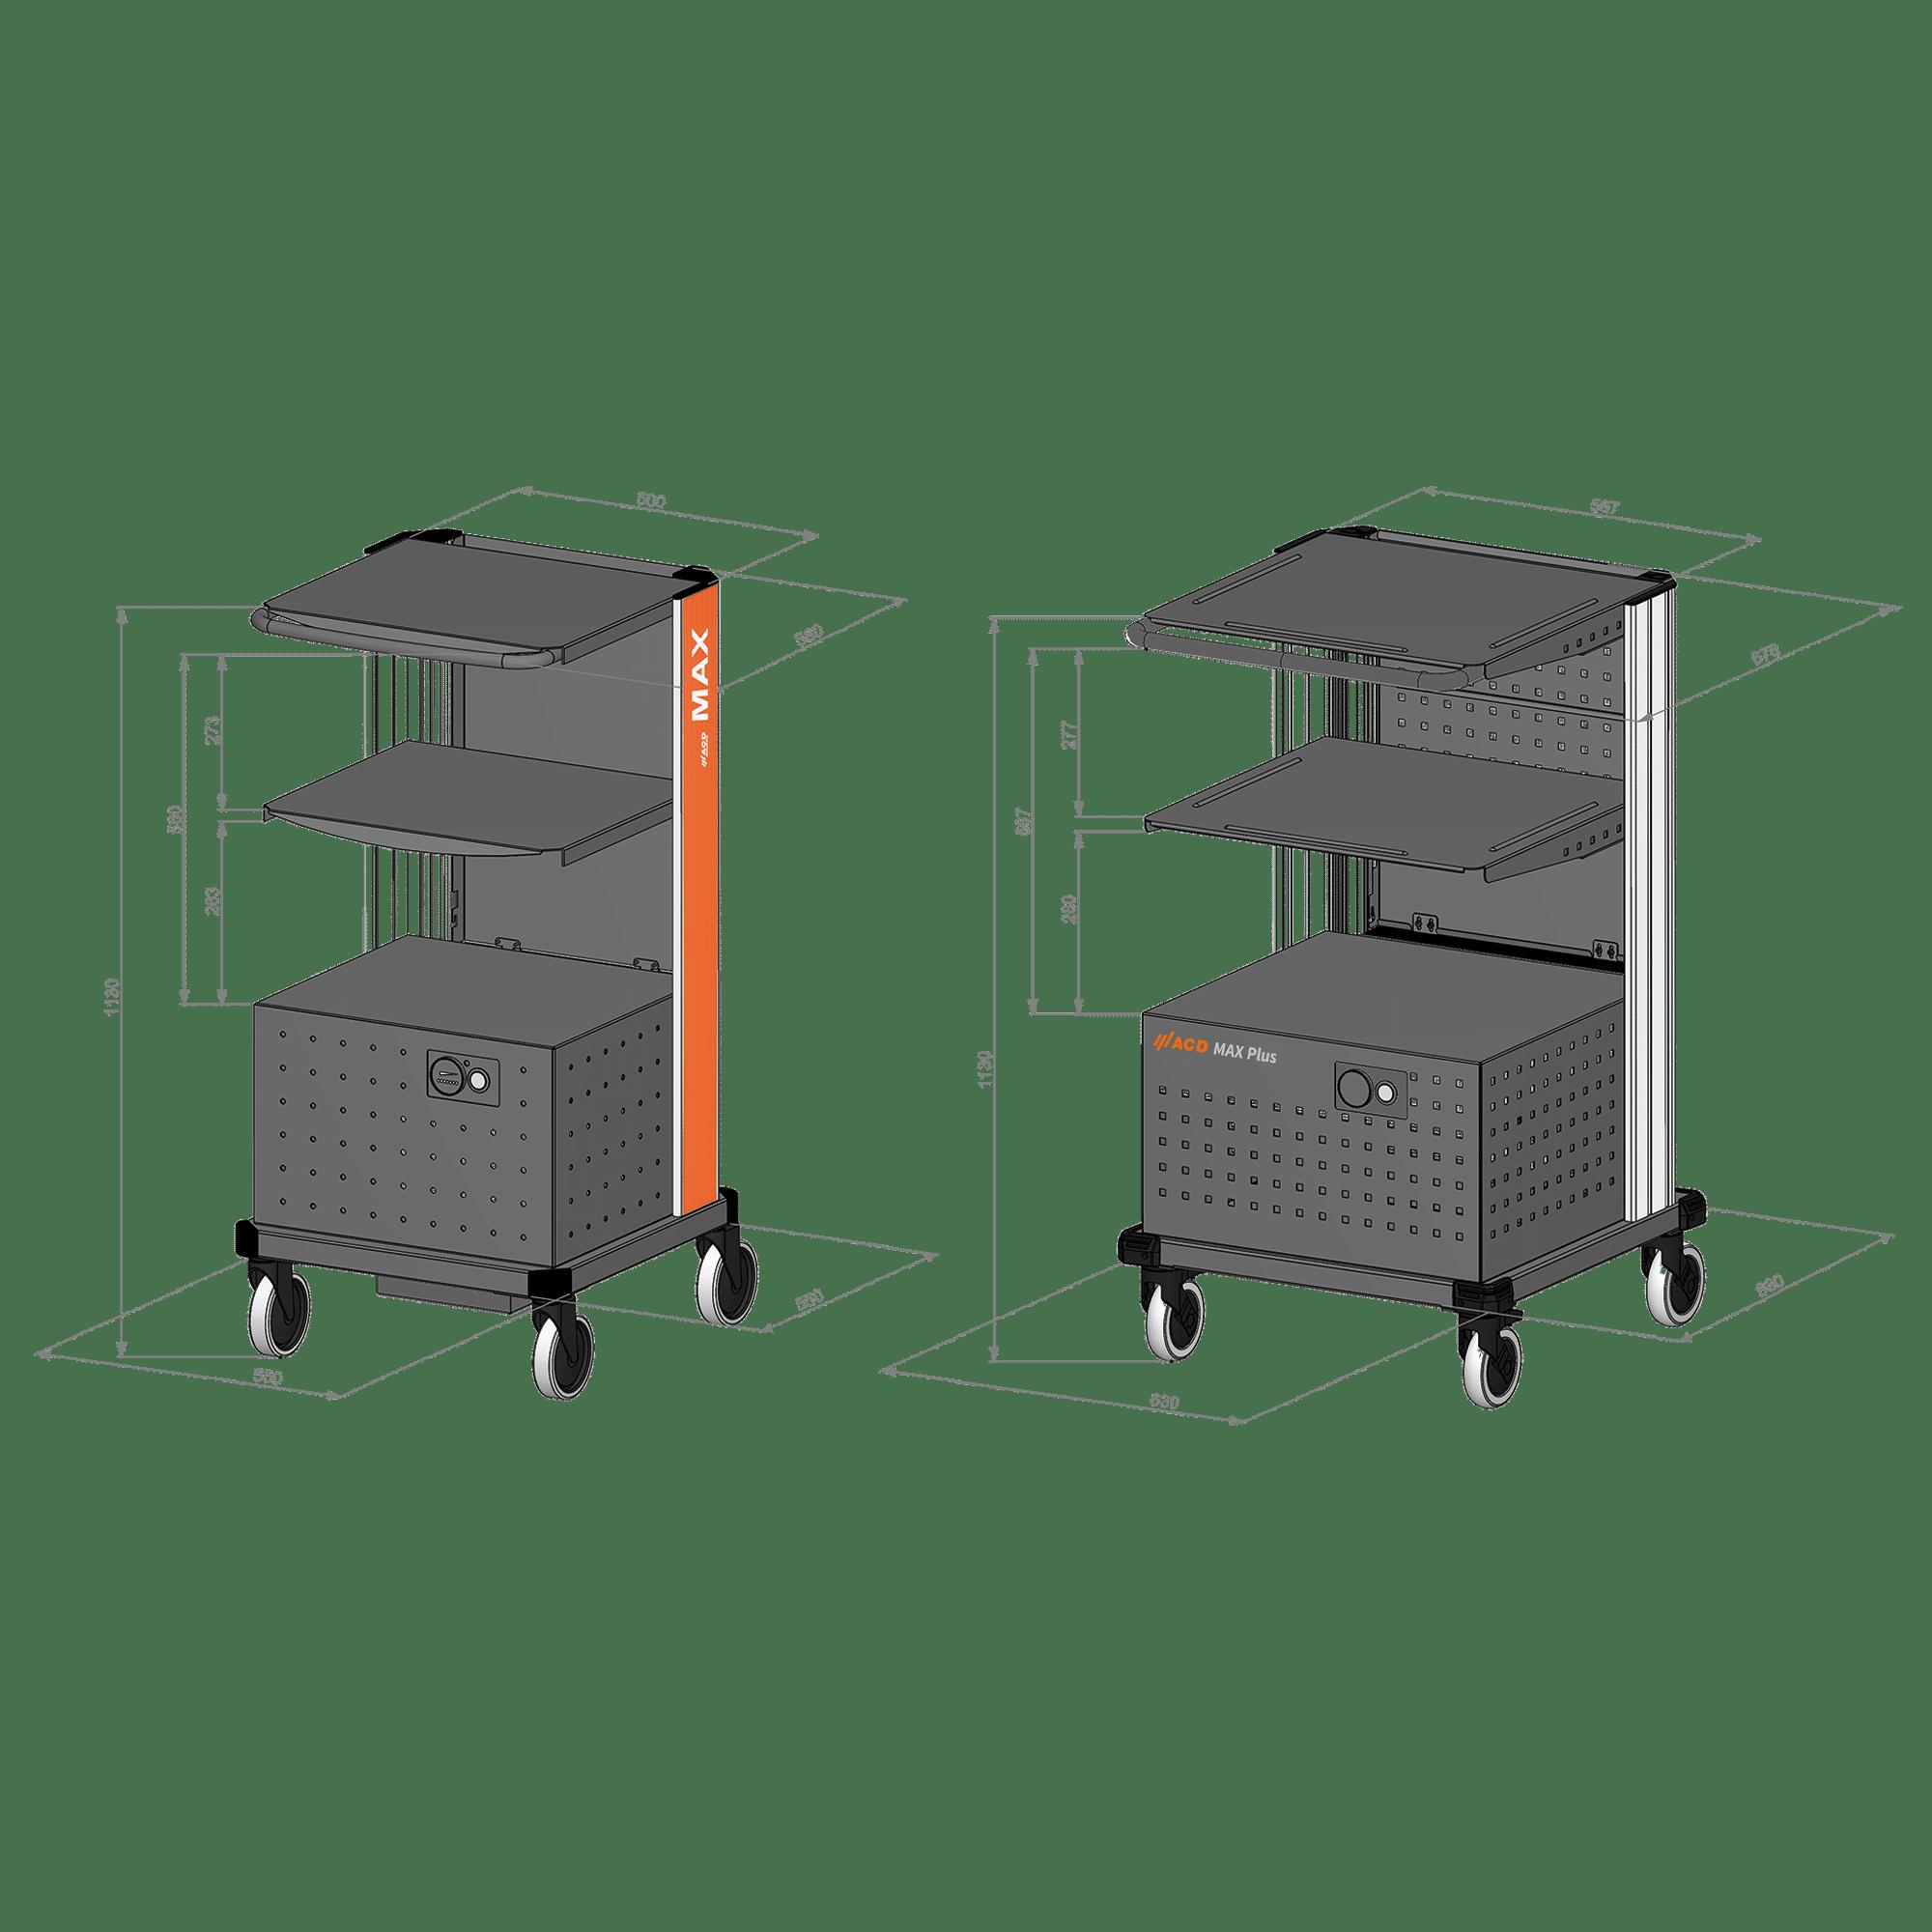 Mobile Workstation MAX PLUS vs MAX STD